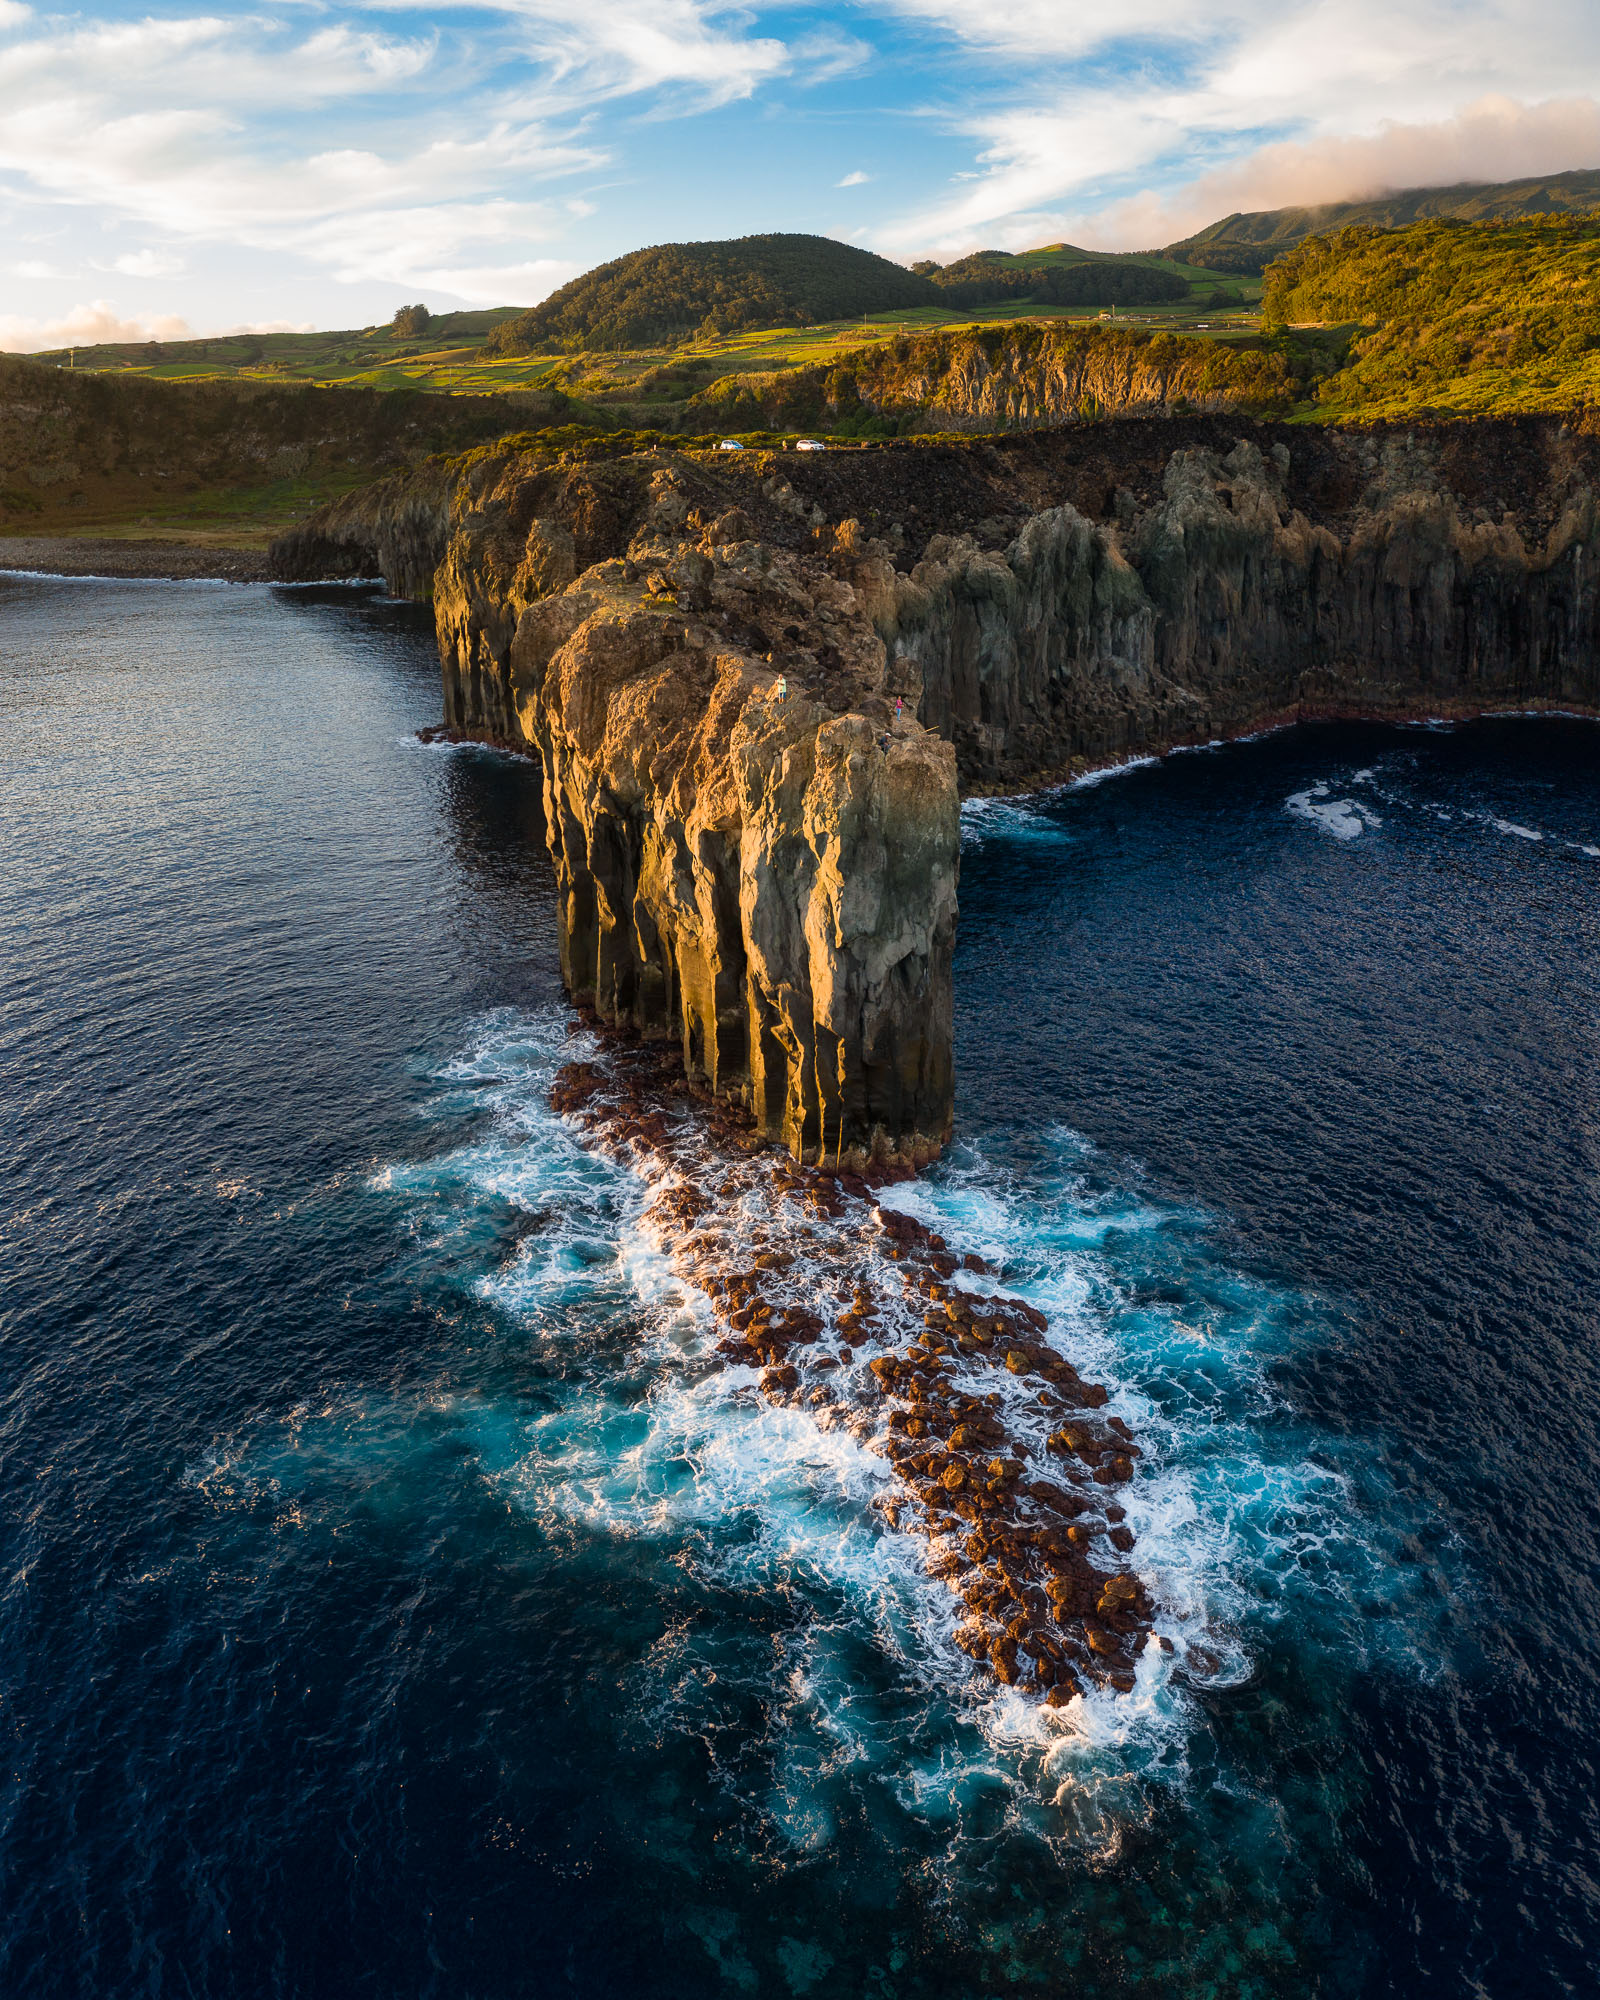 Amazing seascape cliffs of Baías da Agualva hiking trail, Terceira Island, Azores